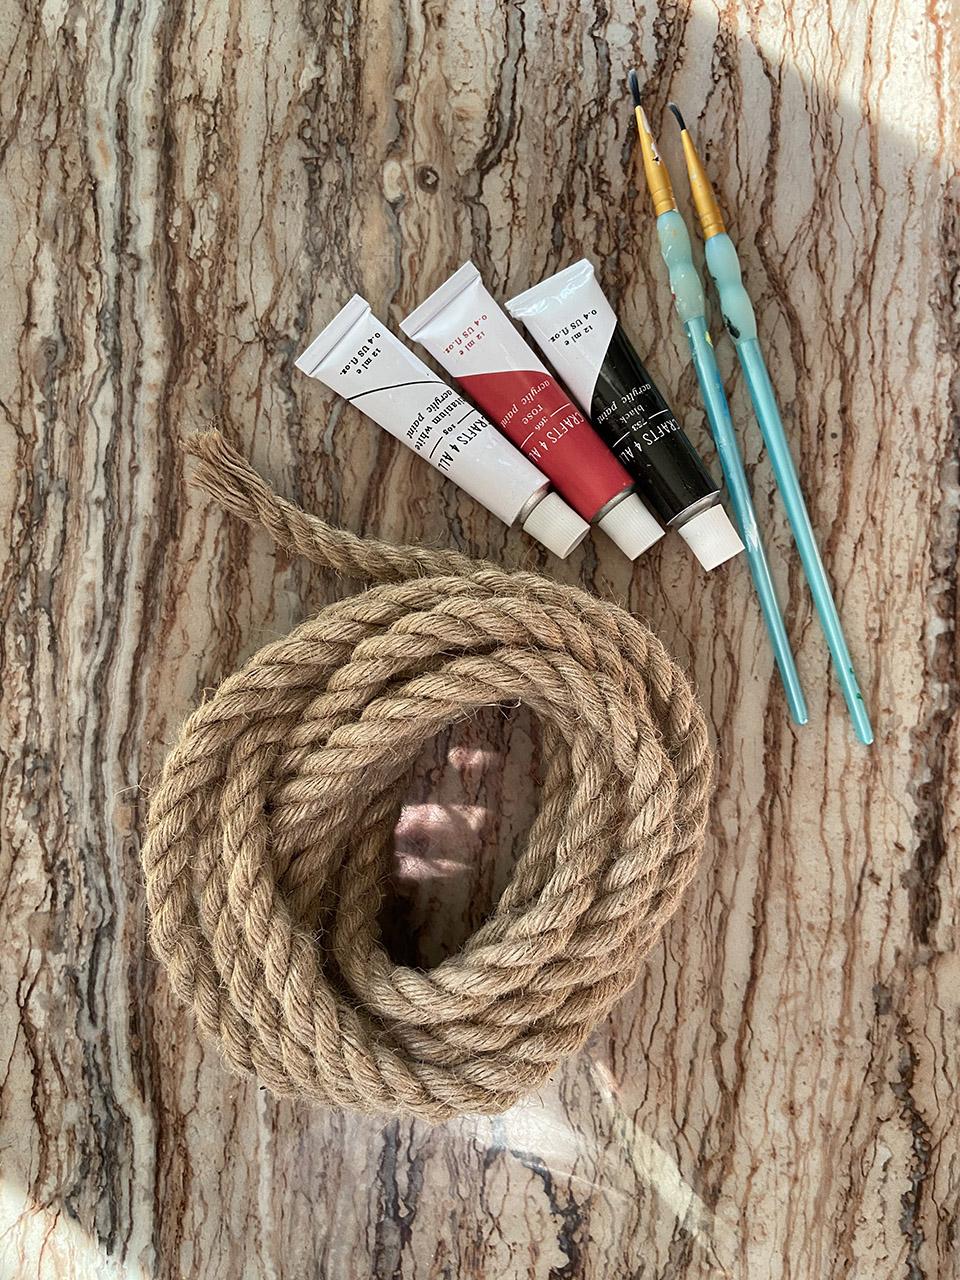 Hanging Bird Rock Craft Materials 2 Jessica White